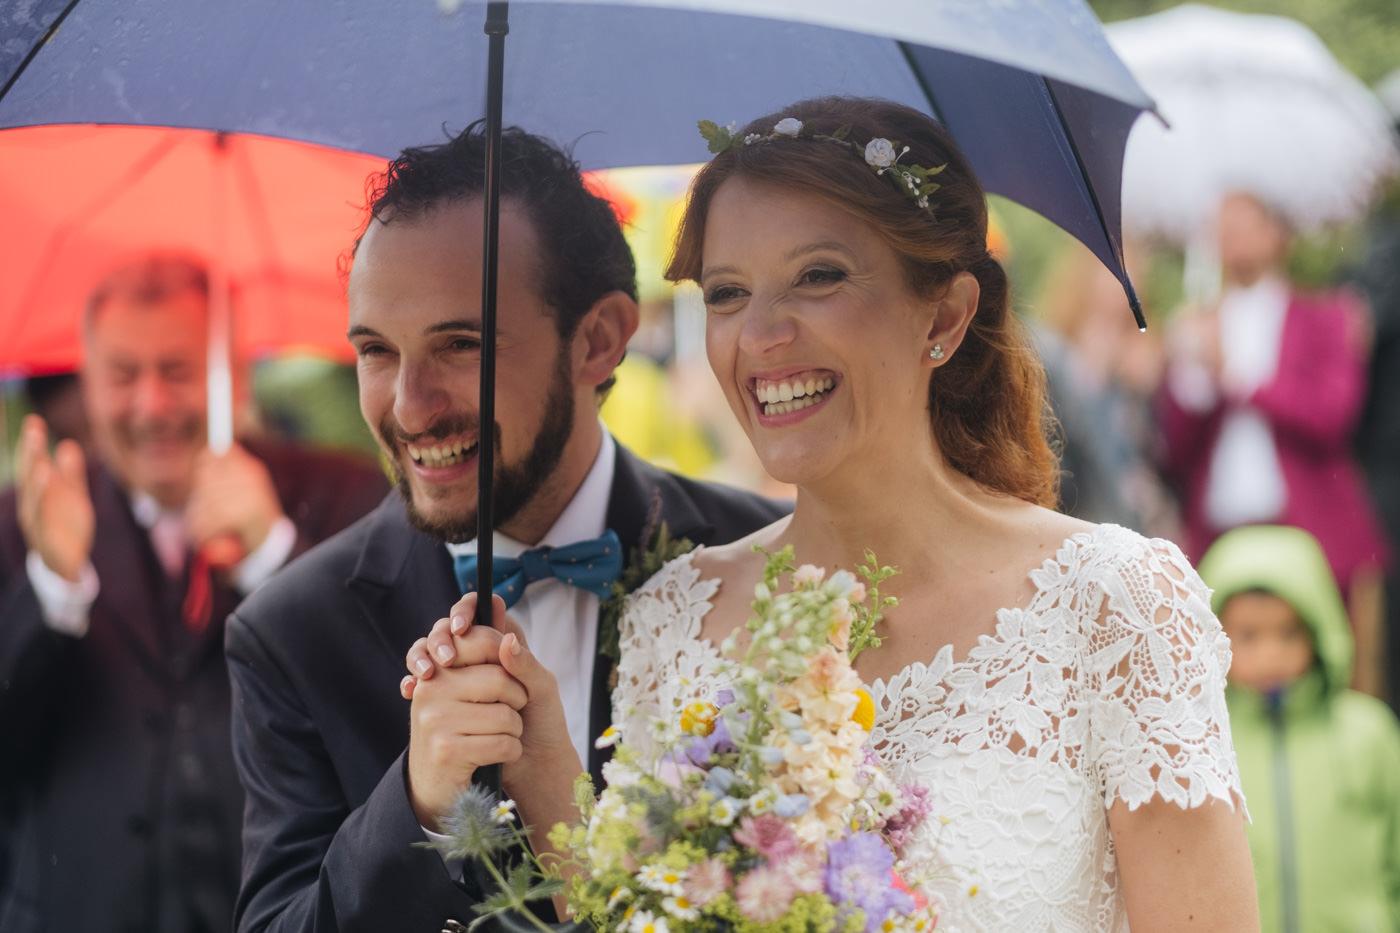 matrimoni_all_italiana_fotografo_matrimonio_toscana-36.jpg